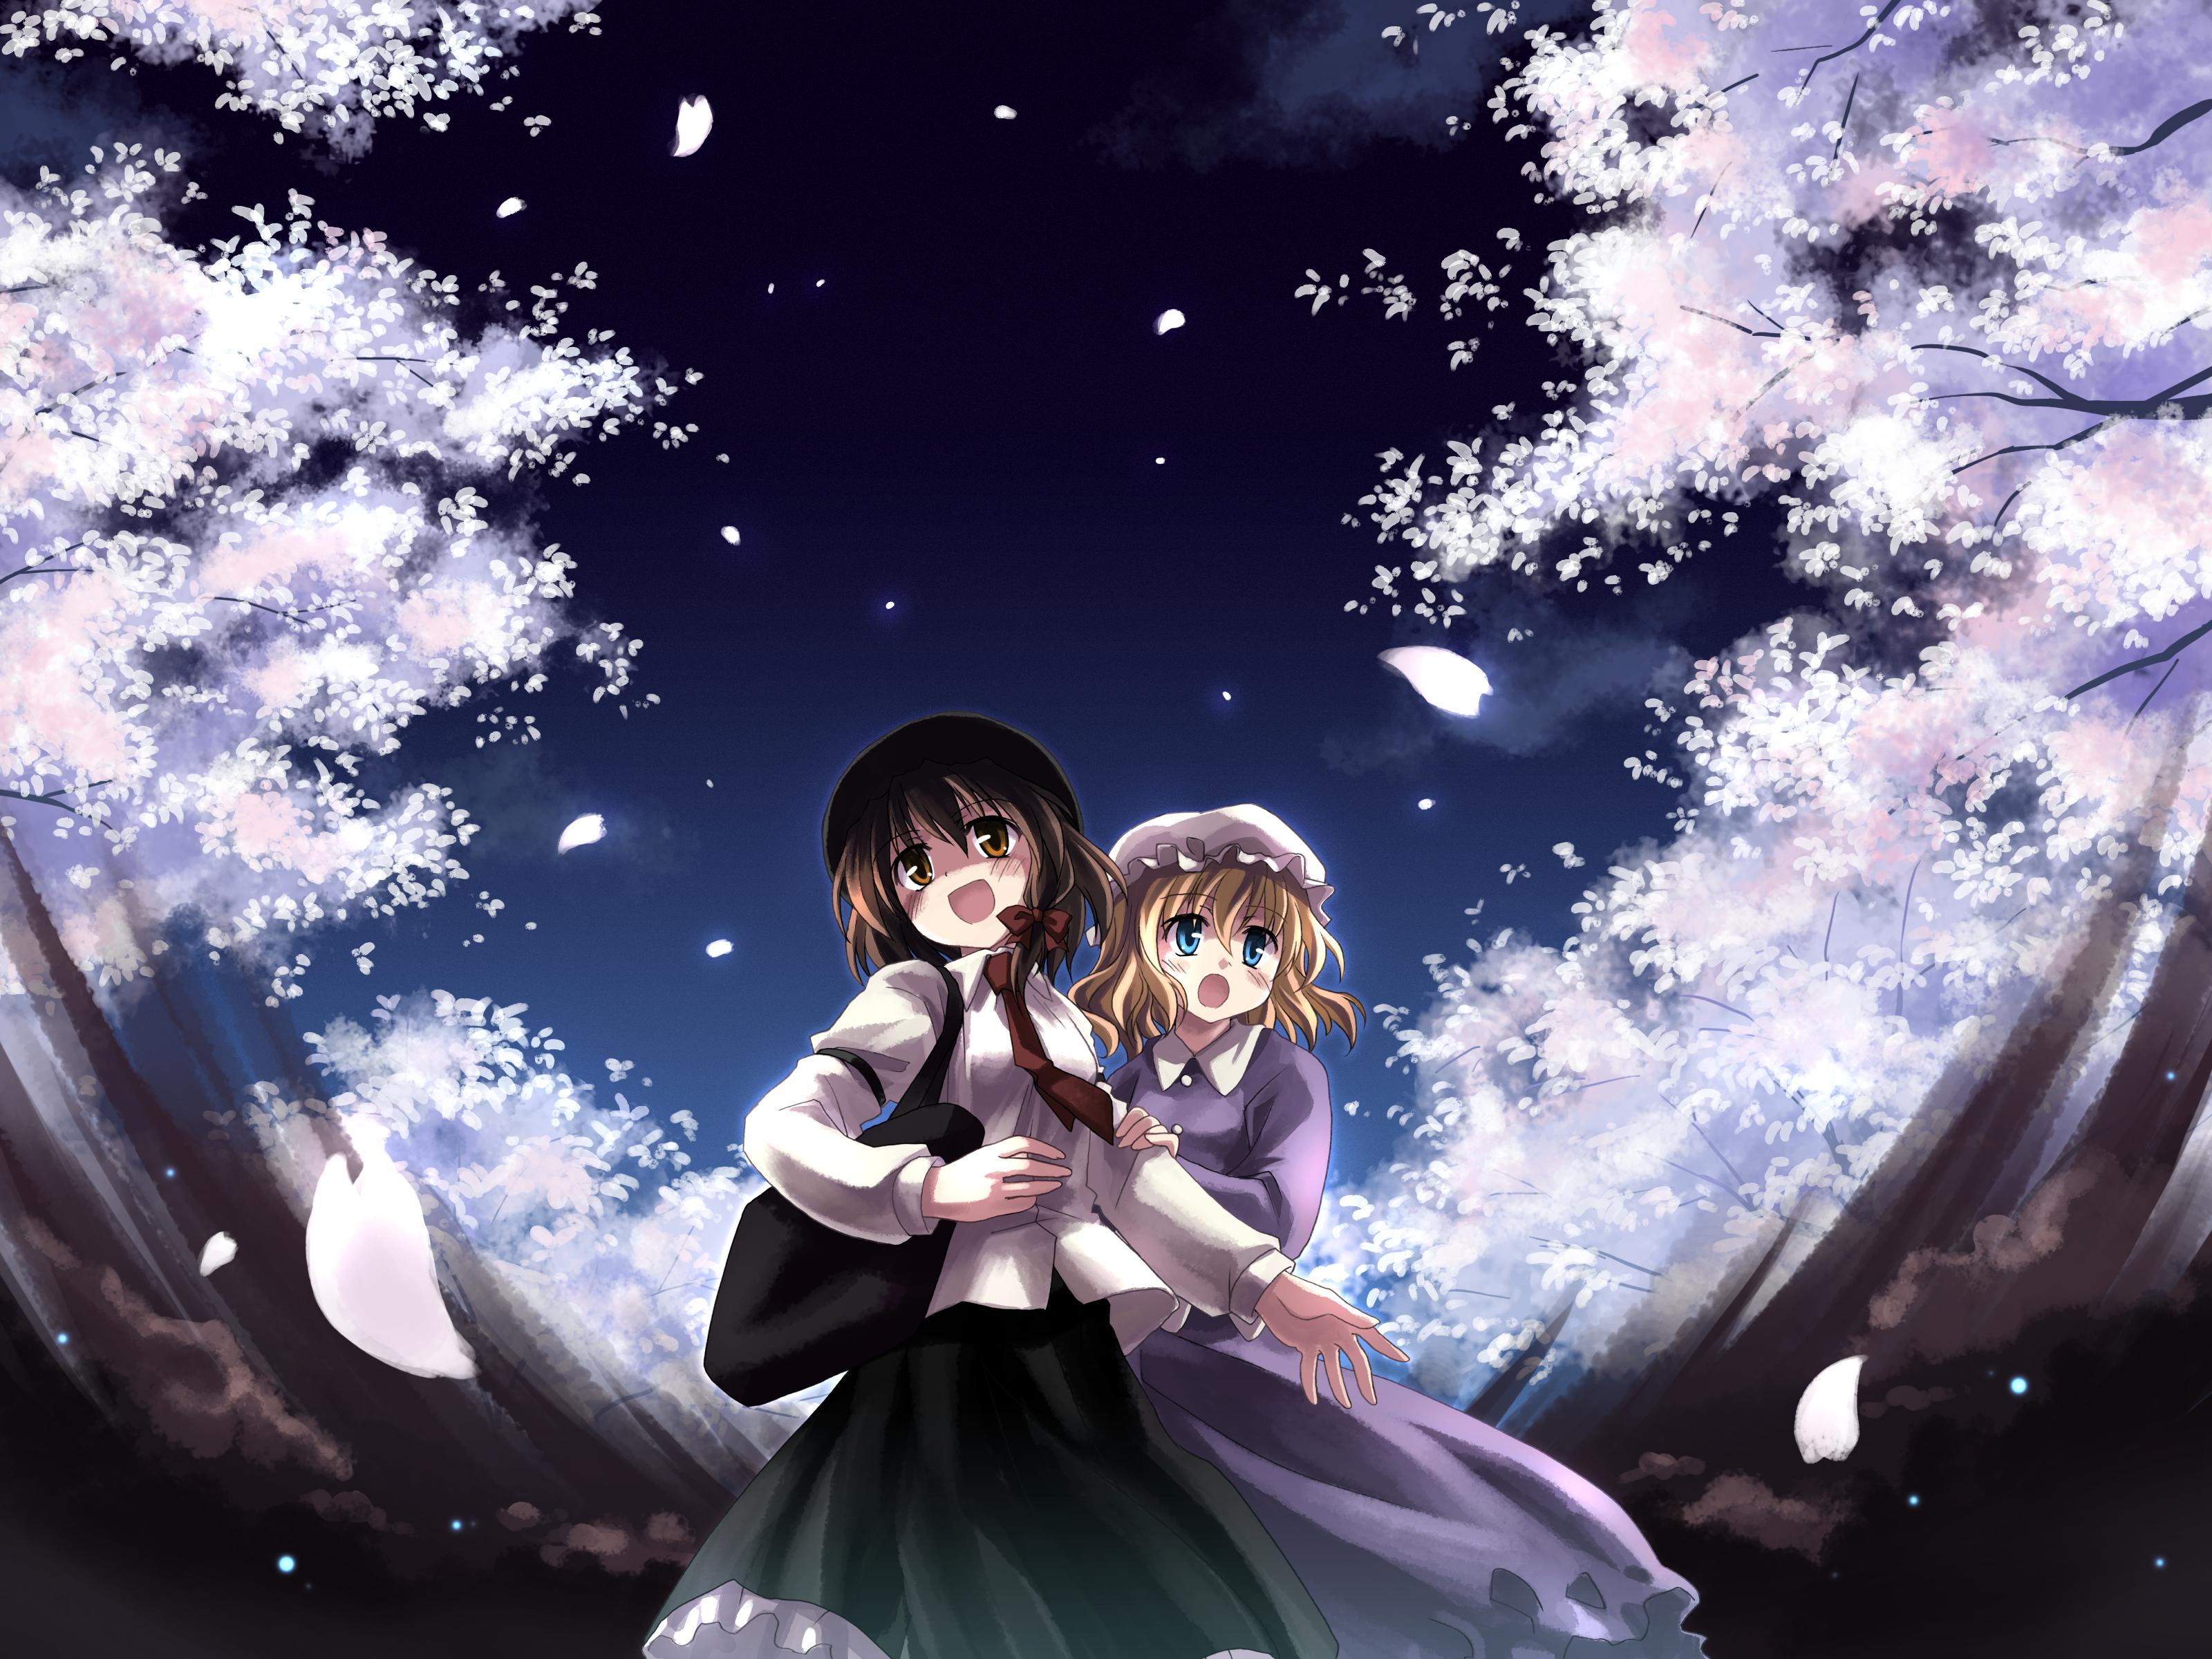 Usami Renko & Maribel Han by uki